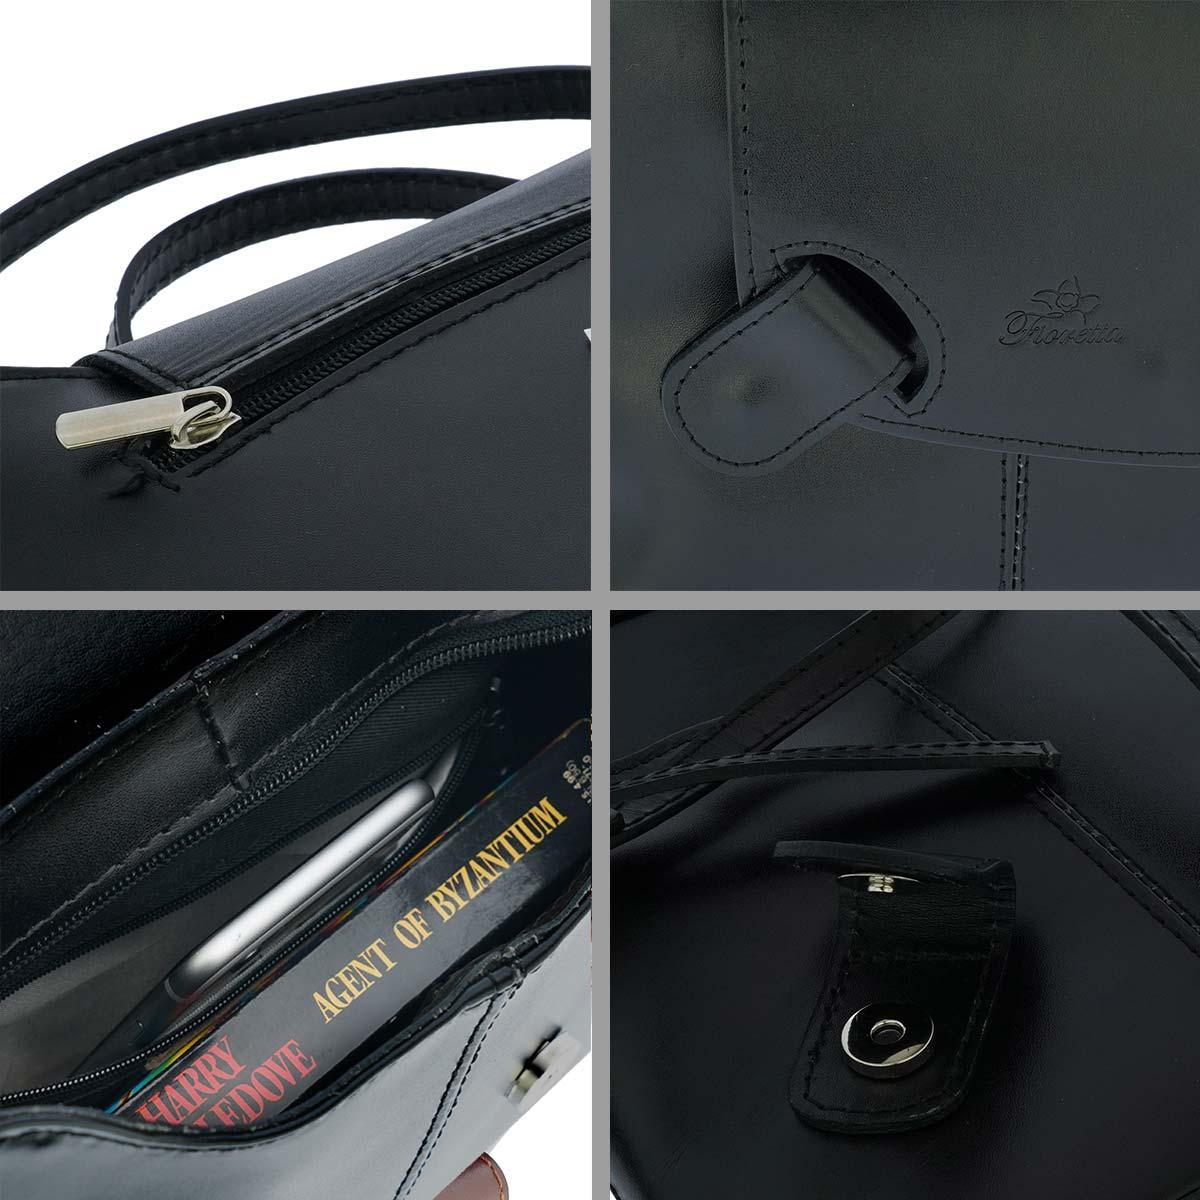 Fioretta Italian Genuine Leather Crossbody Shoulder Bag Handbag For Women - Black